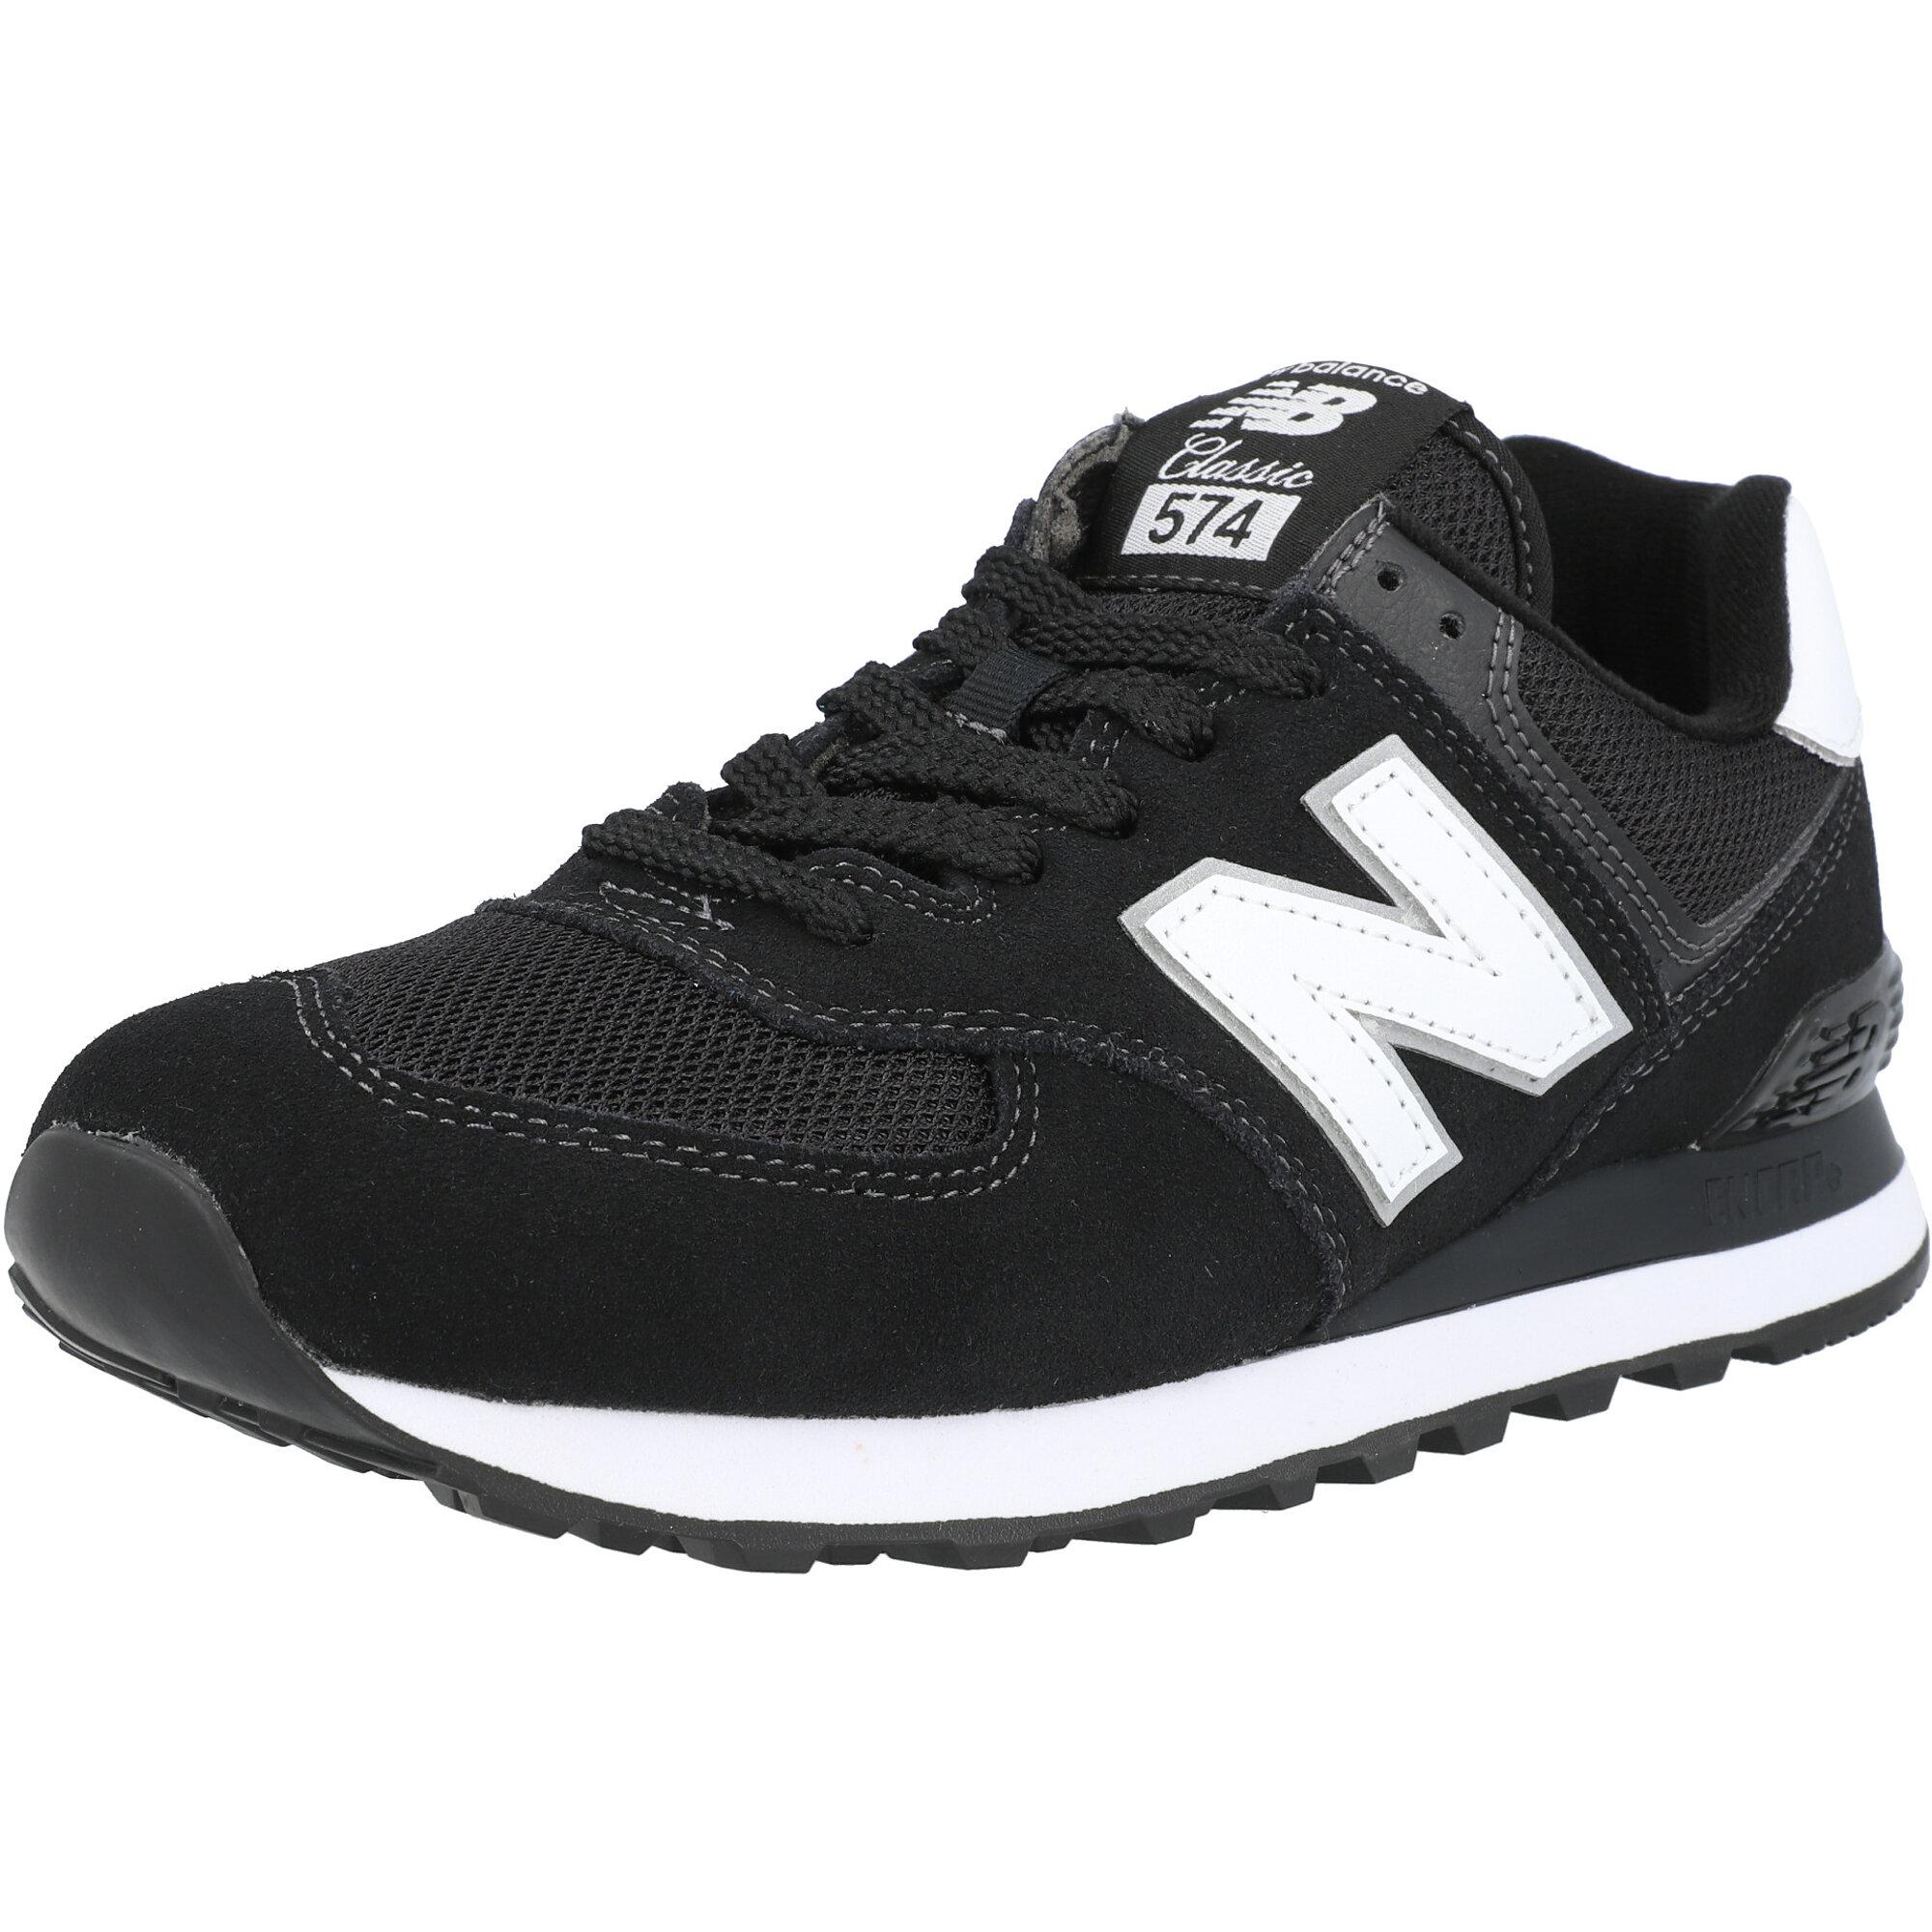 New Balance 574 Black/White Suede